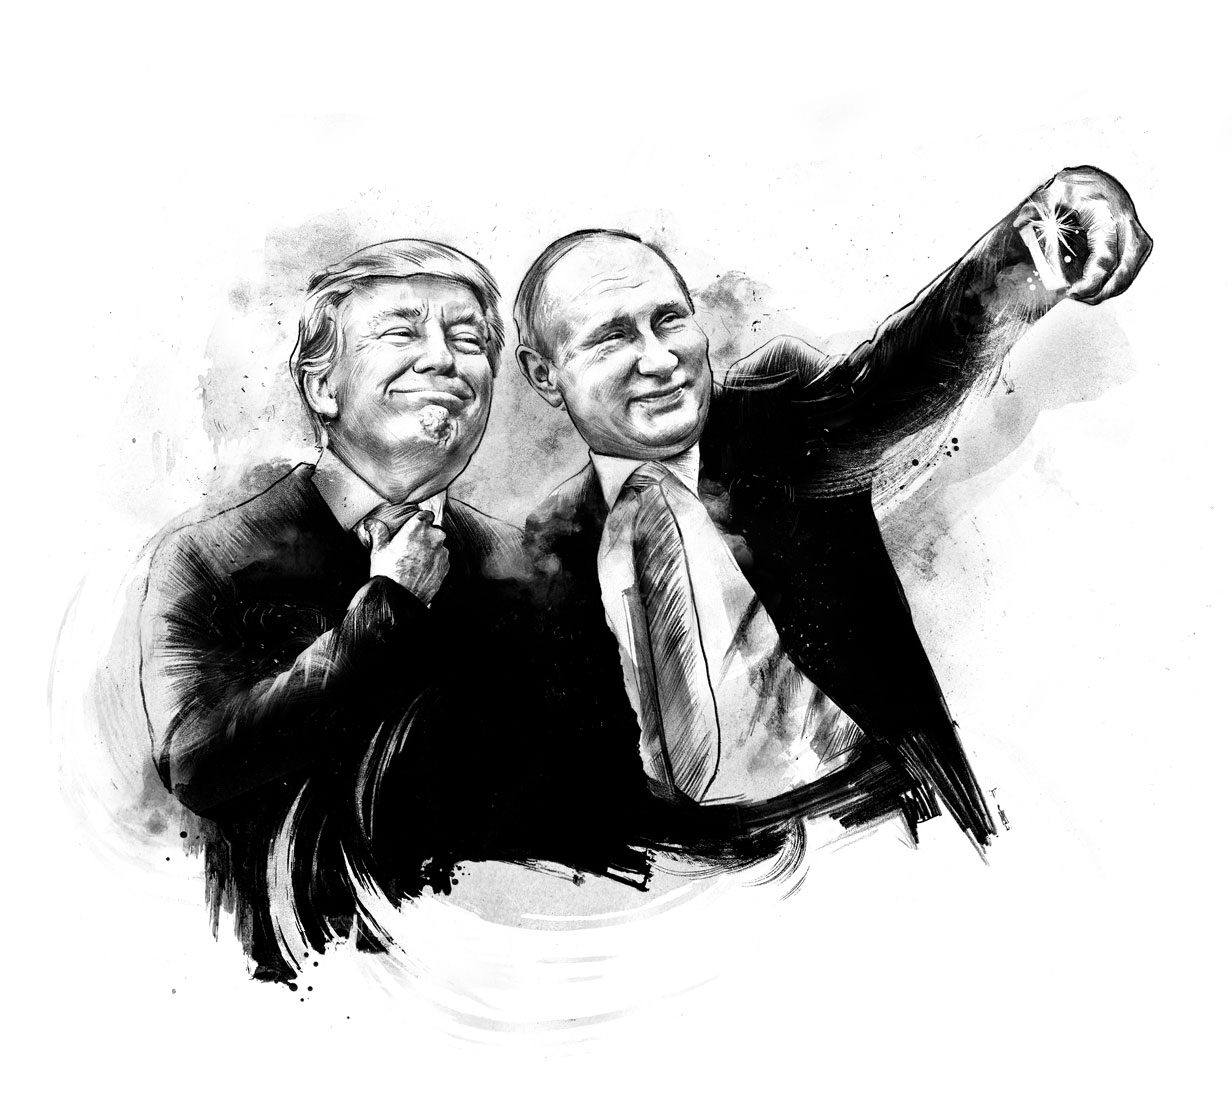 Trump putin - Kornel Illustration | Kornel Stadler portfolio